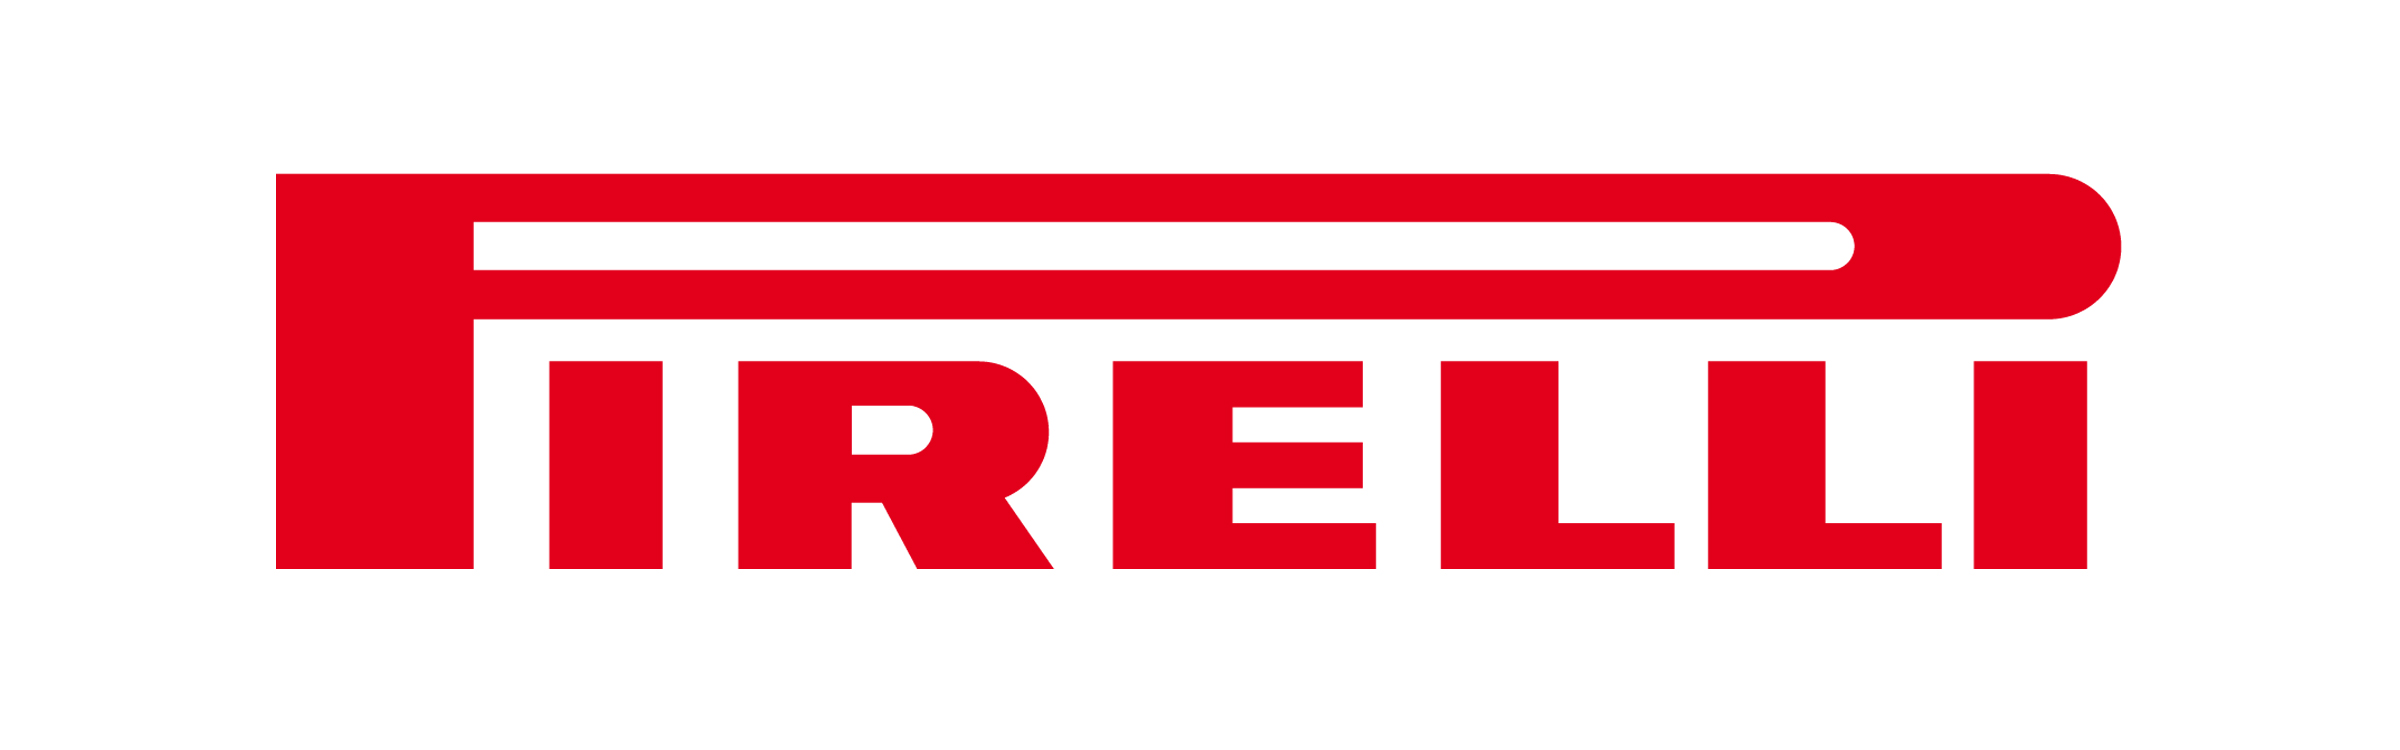 pirelli-ok